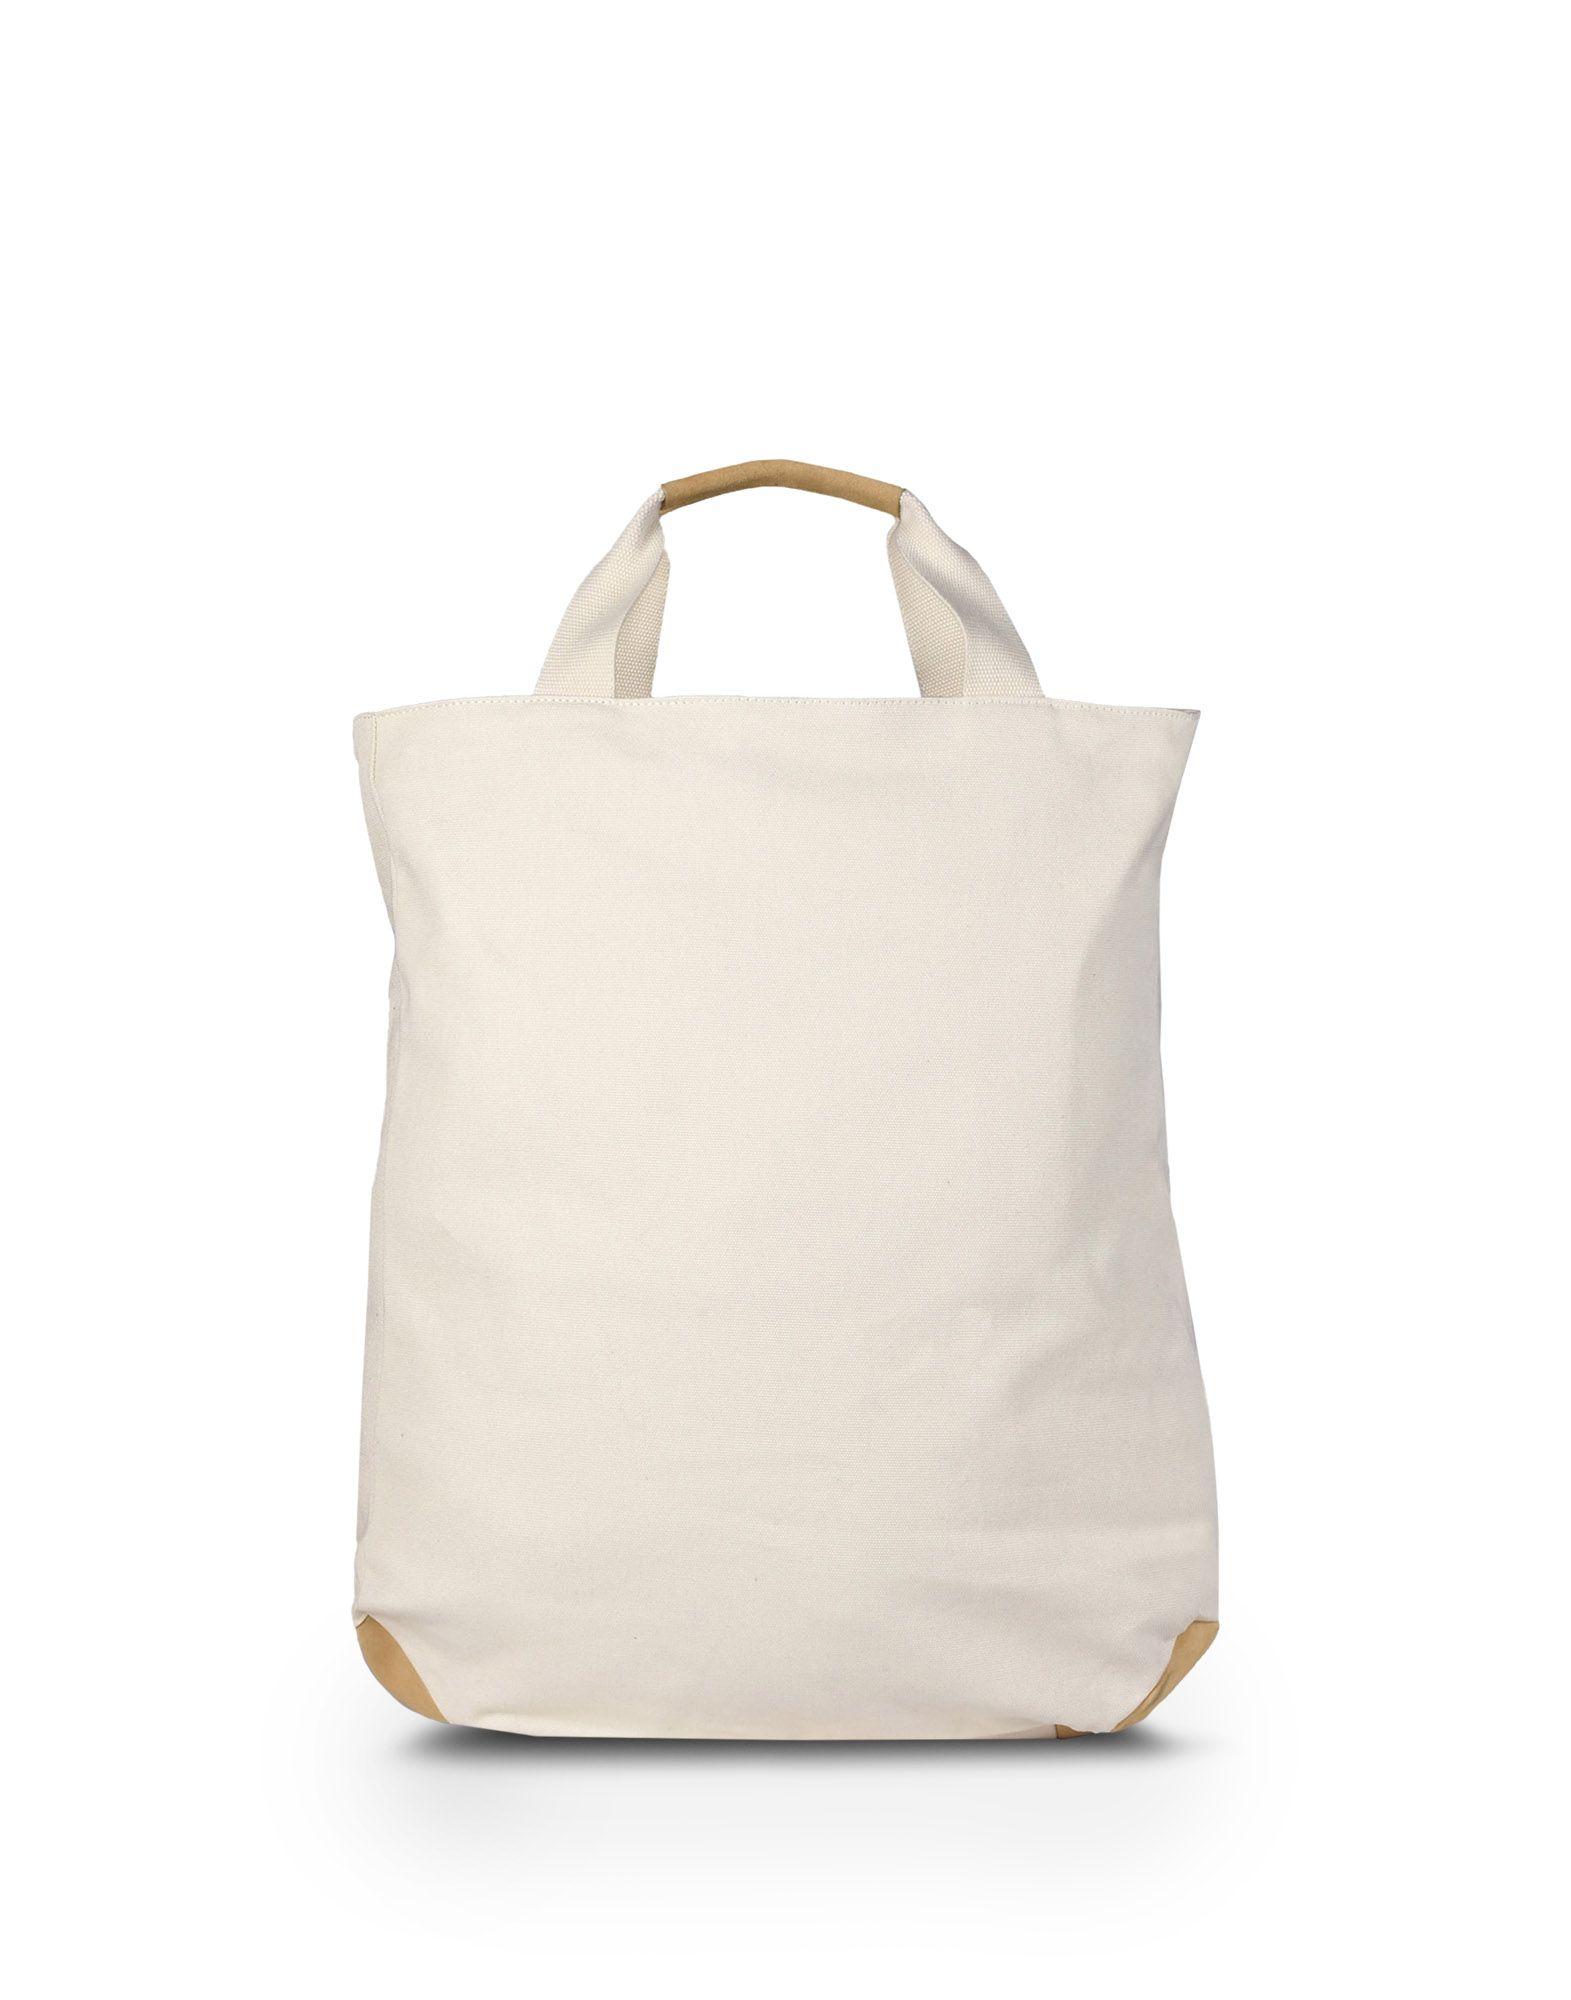 Y-3 Y-3 TOTE BAG Medium fabric bag E e